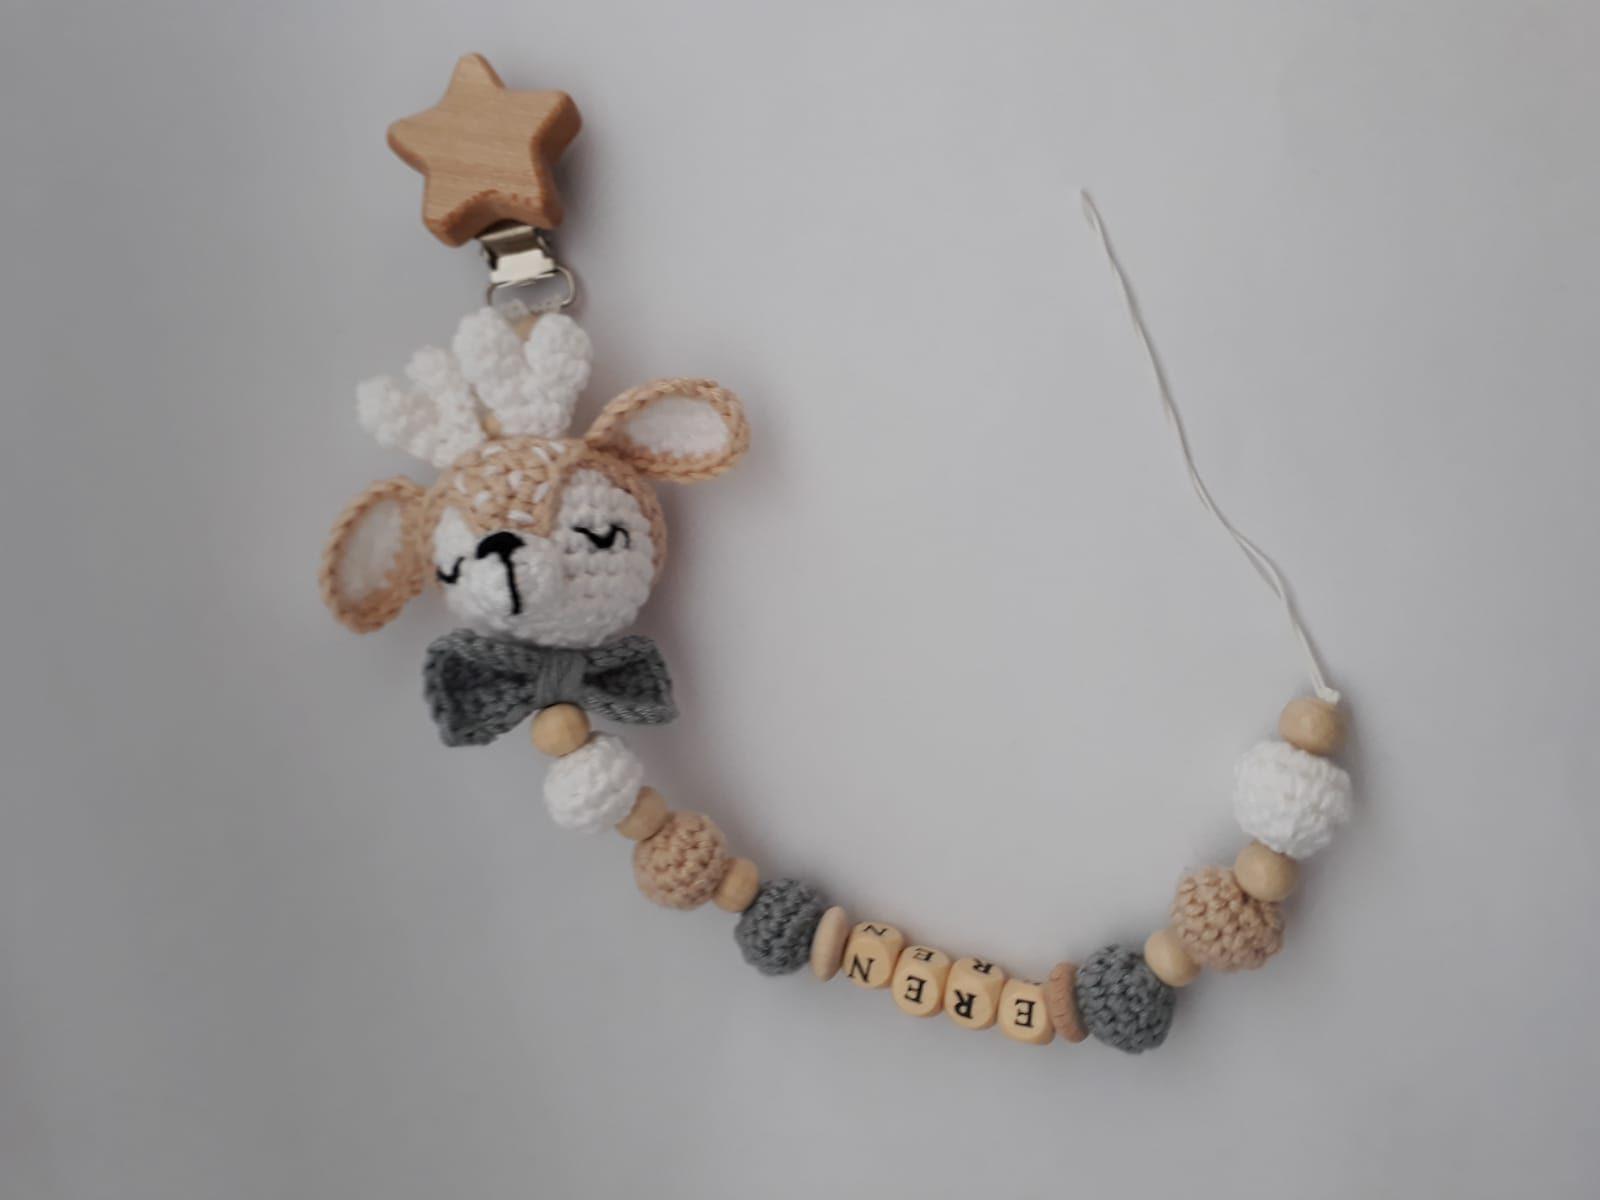 Amigurumi Deer Recipe Making | Weihnachten häkeln, Amigurumi ... | 1200x1600